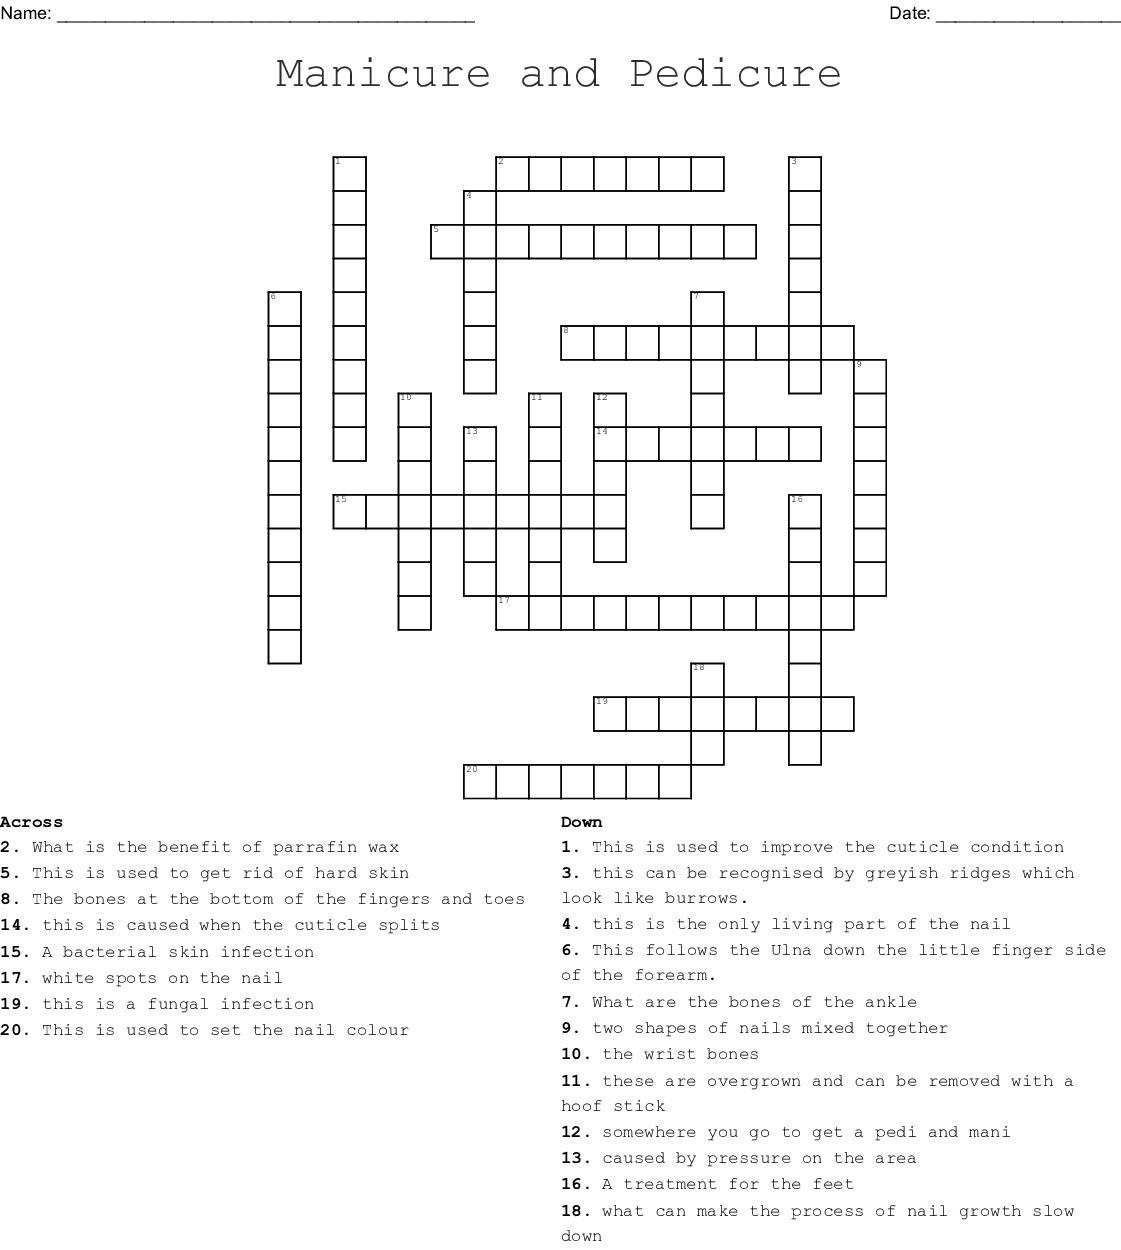 Manicure And Pedicure Crossword Puzzle